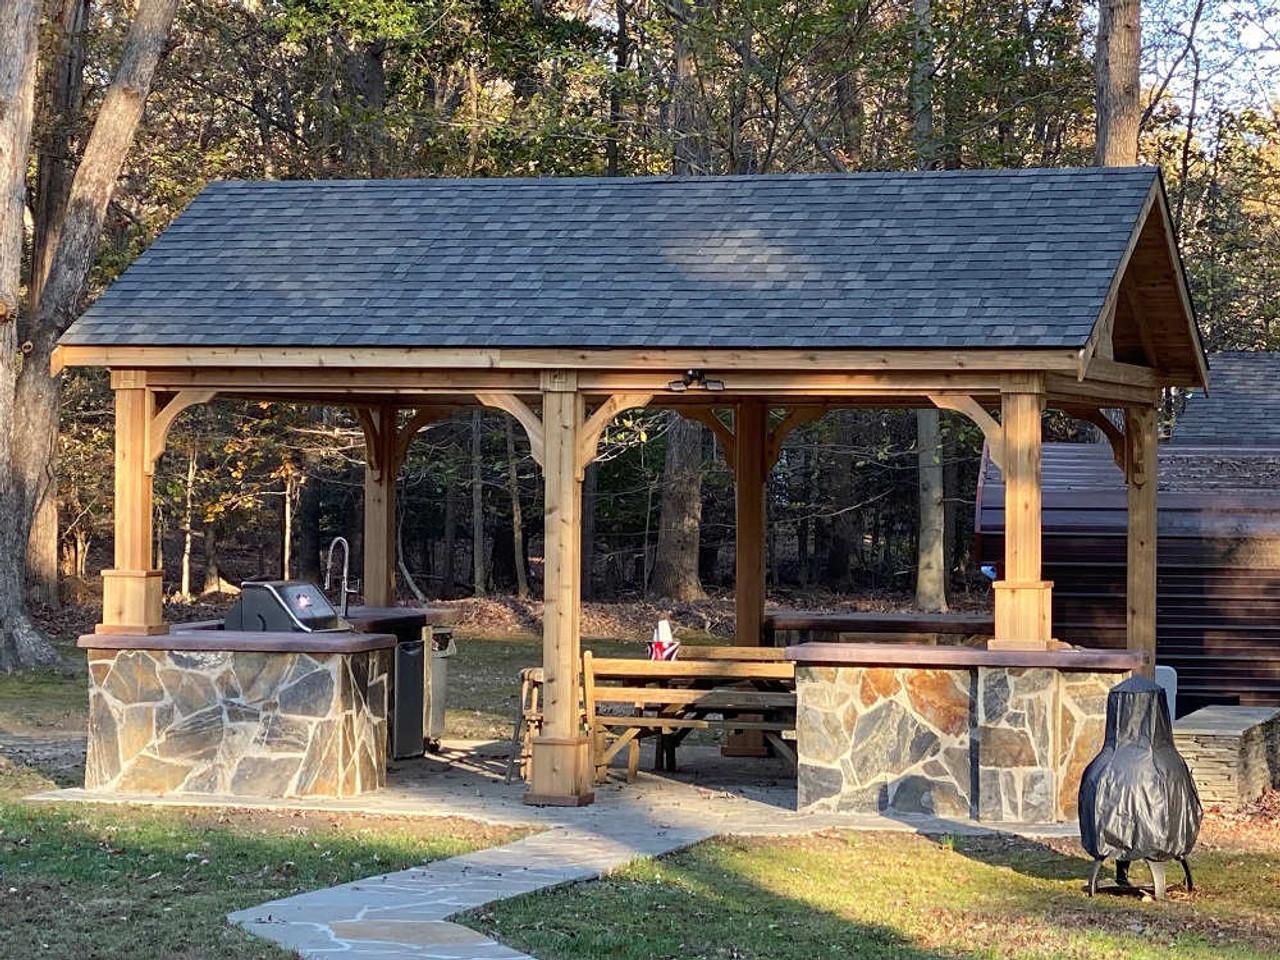 16x20 Red Cedar Gable Roof Pavilion Kit, White Plains, Maryland